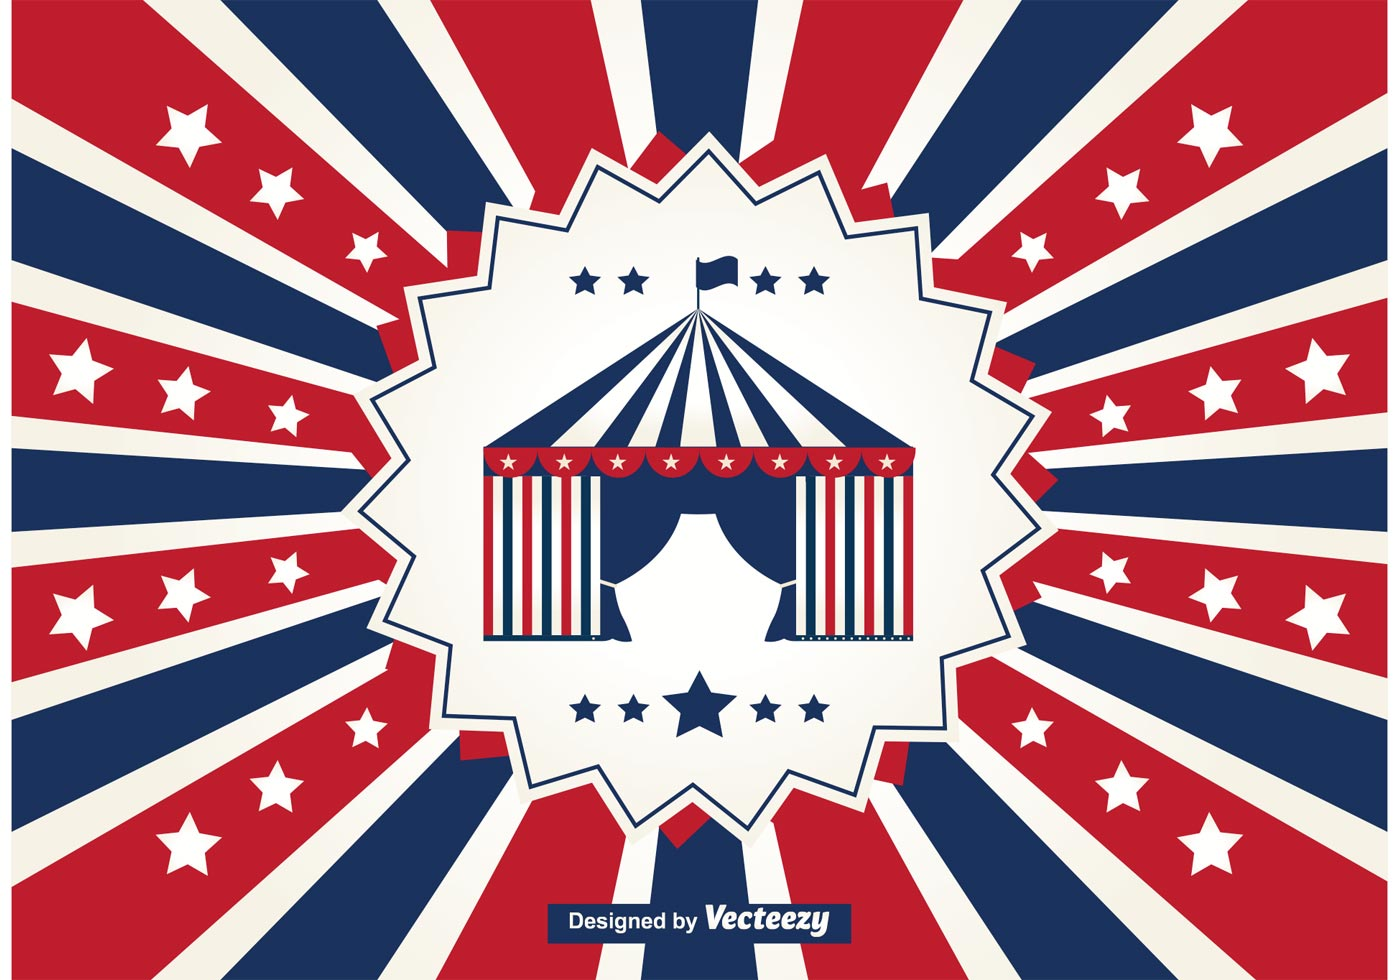 Circus Theme Invitation was nice invitation ideas